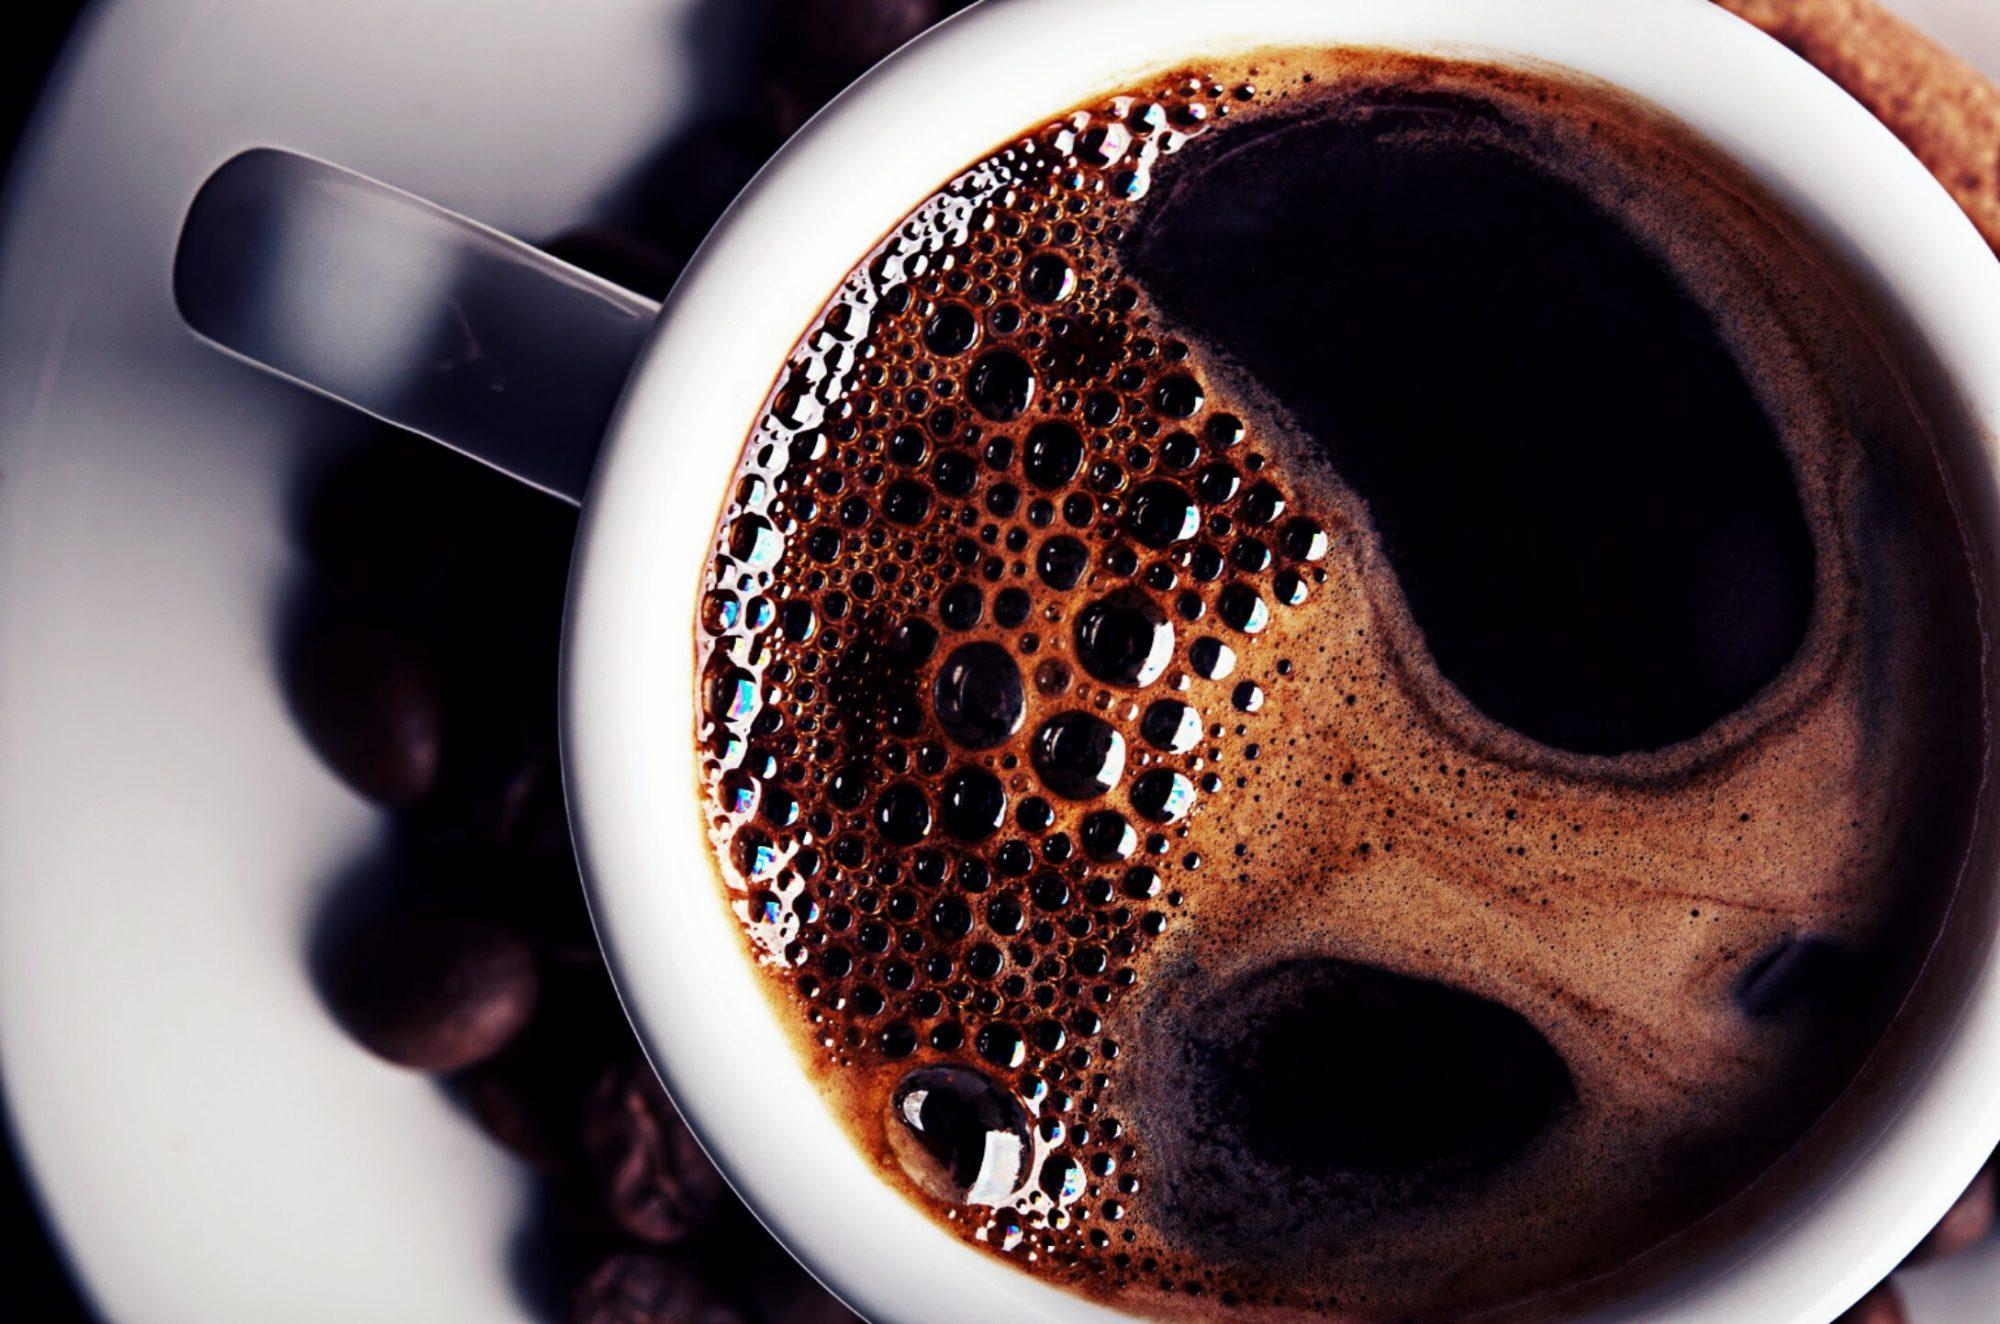 Coffee Getty 1/21/20